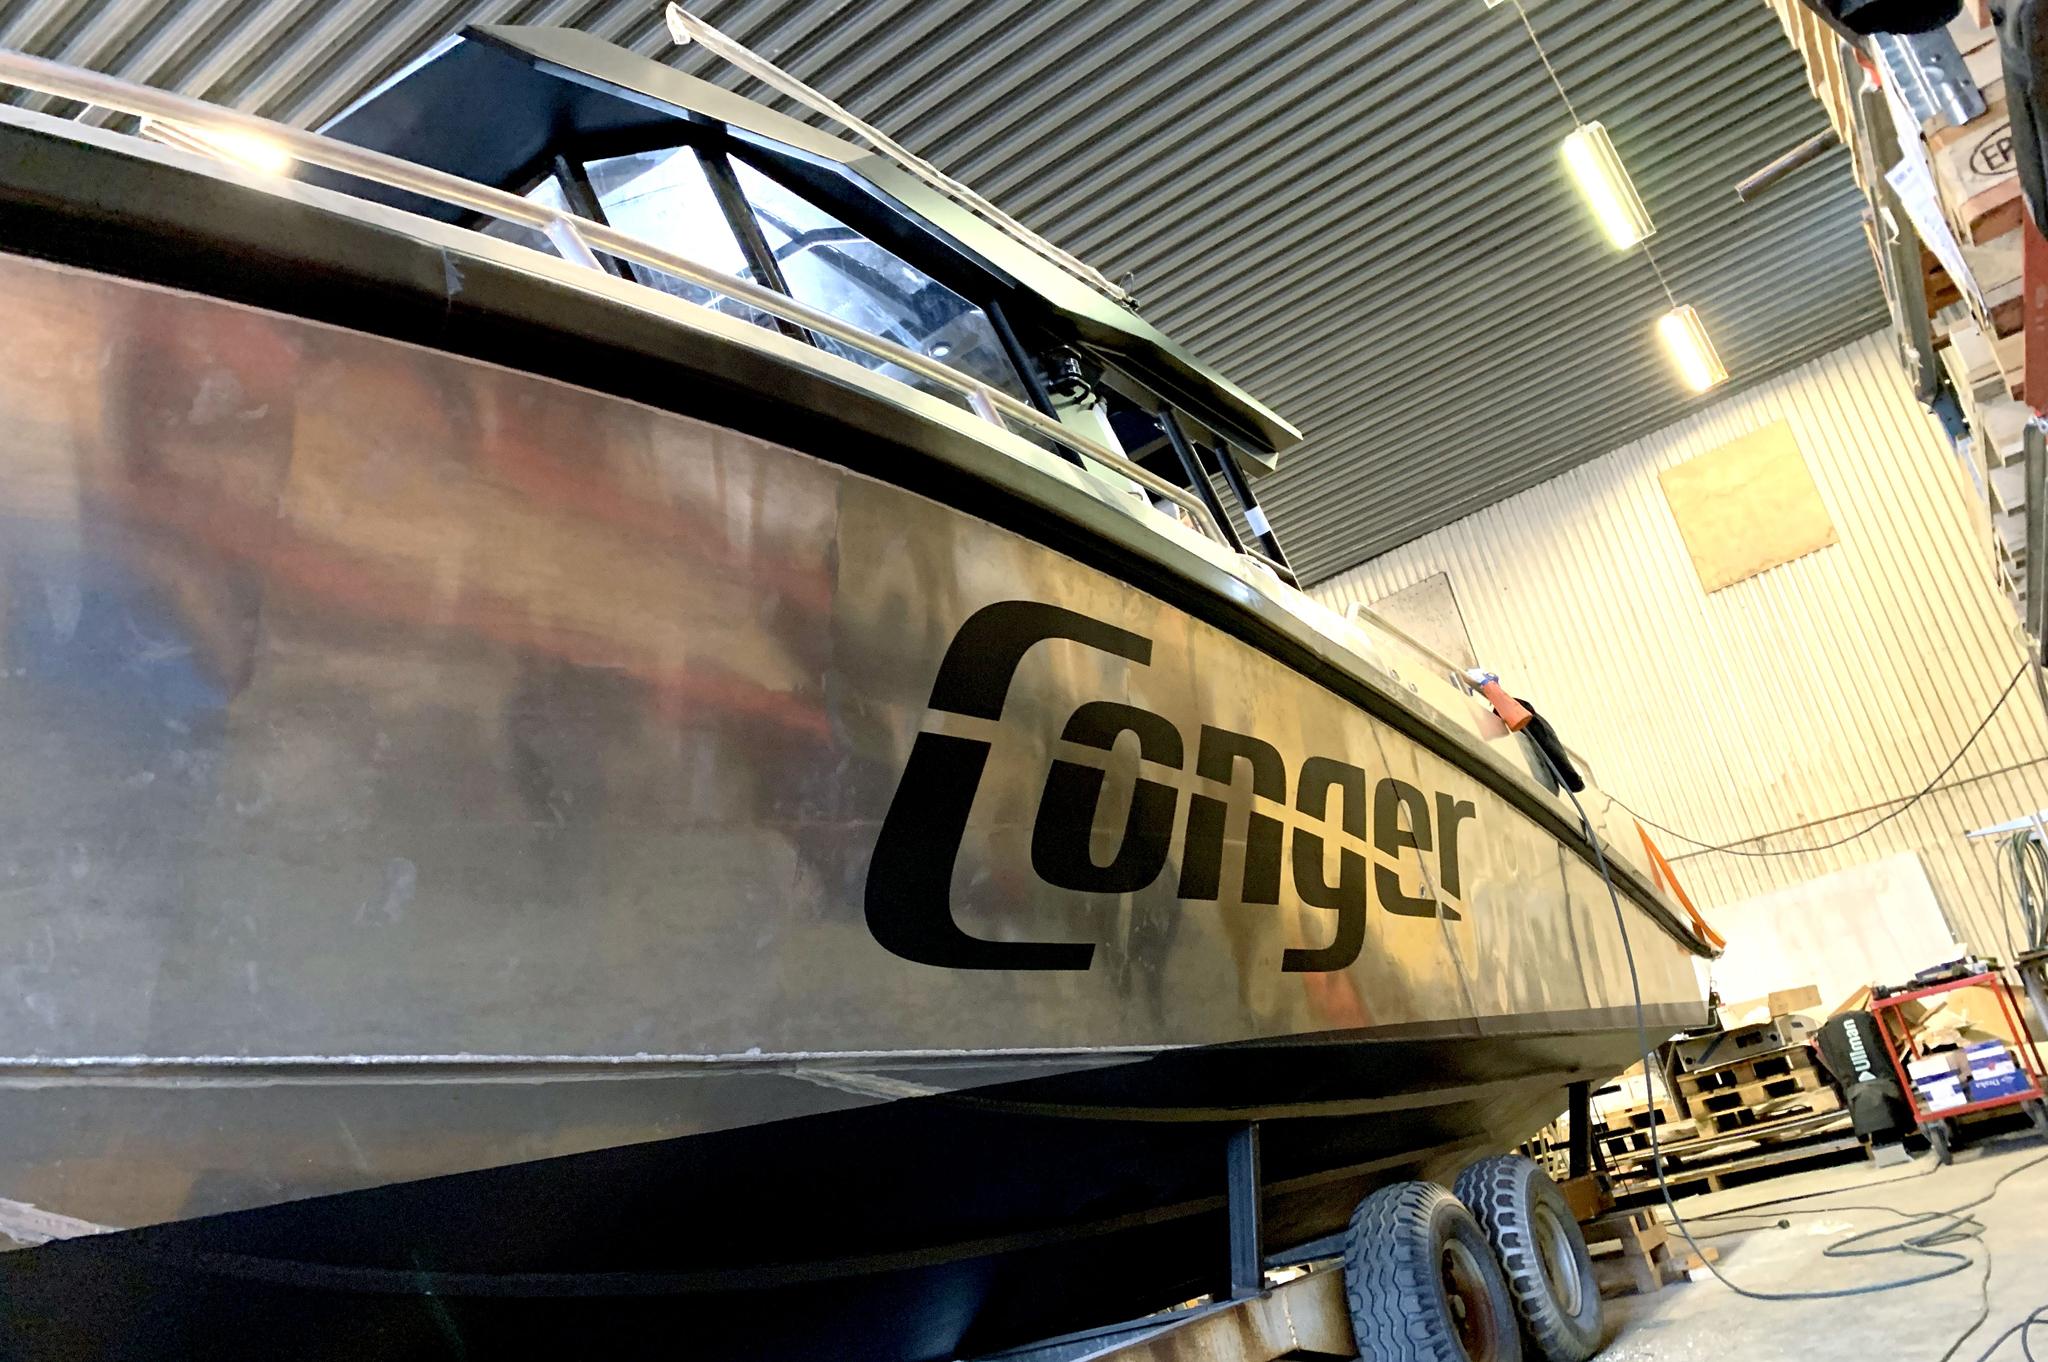 båt dekor dekaler conger